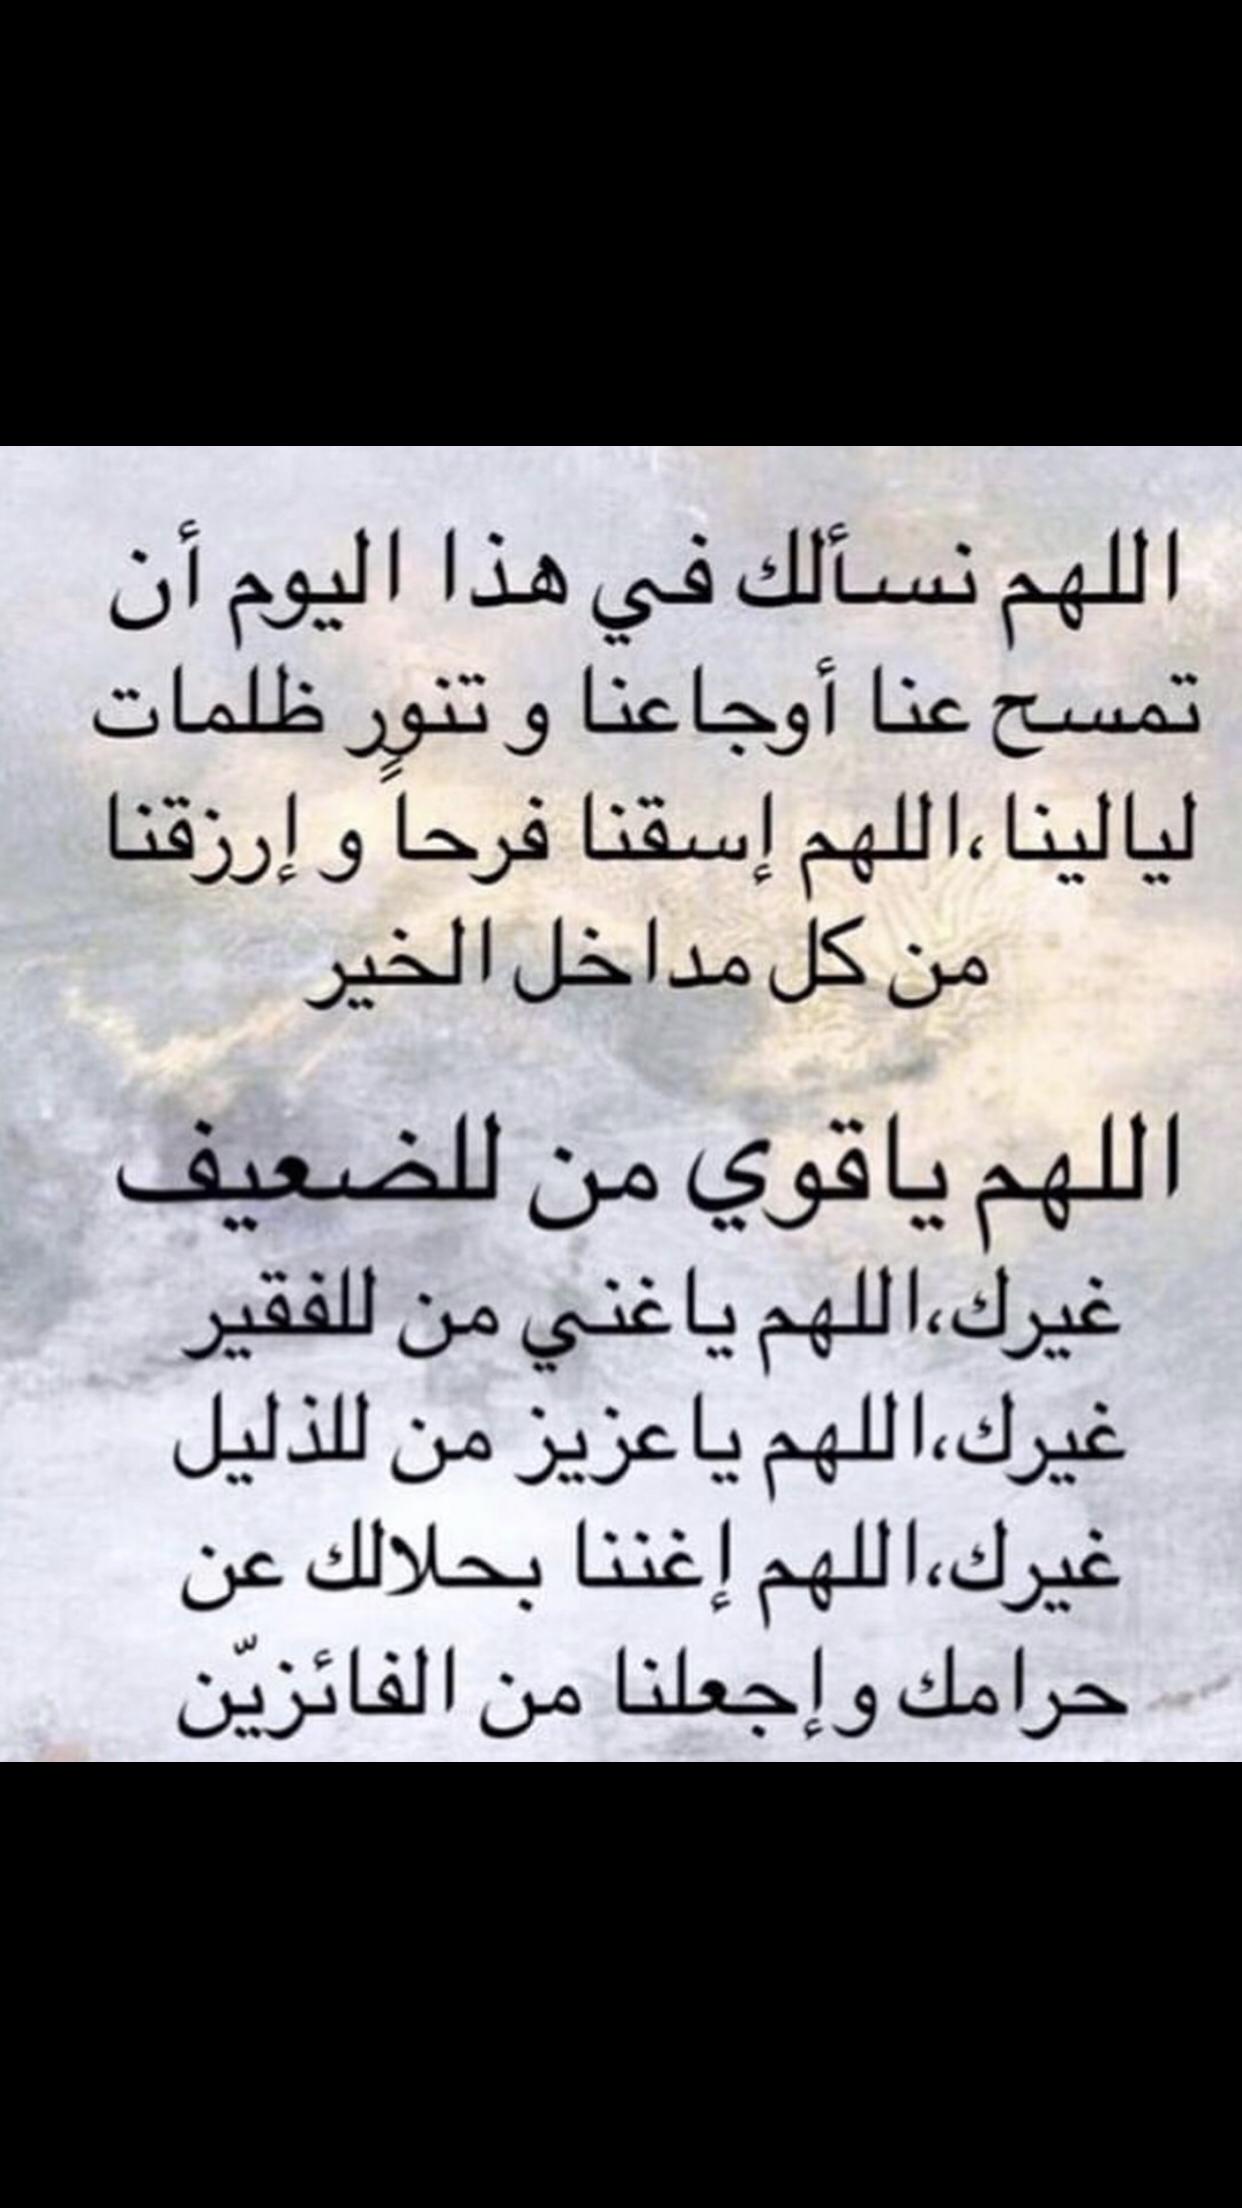 Pin By Sarah Ibra On Allah Islam Hadith Duaa Islam Hadith